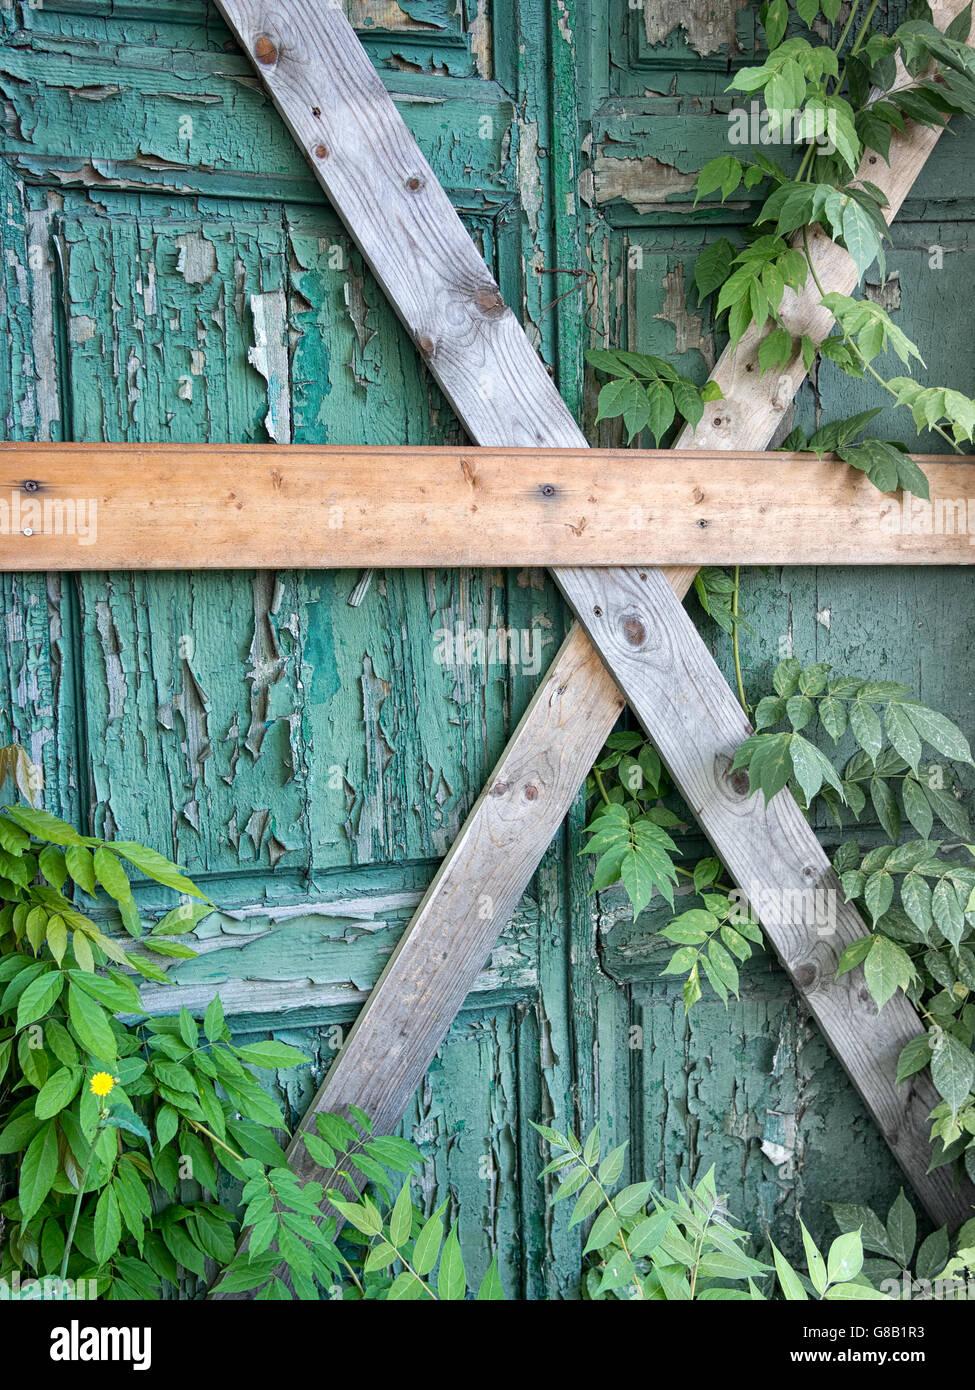 Barred doorway. No entry, exit. - Stock Image